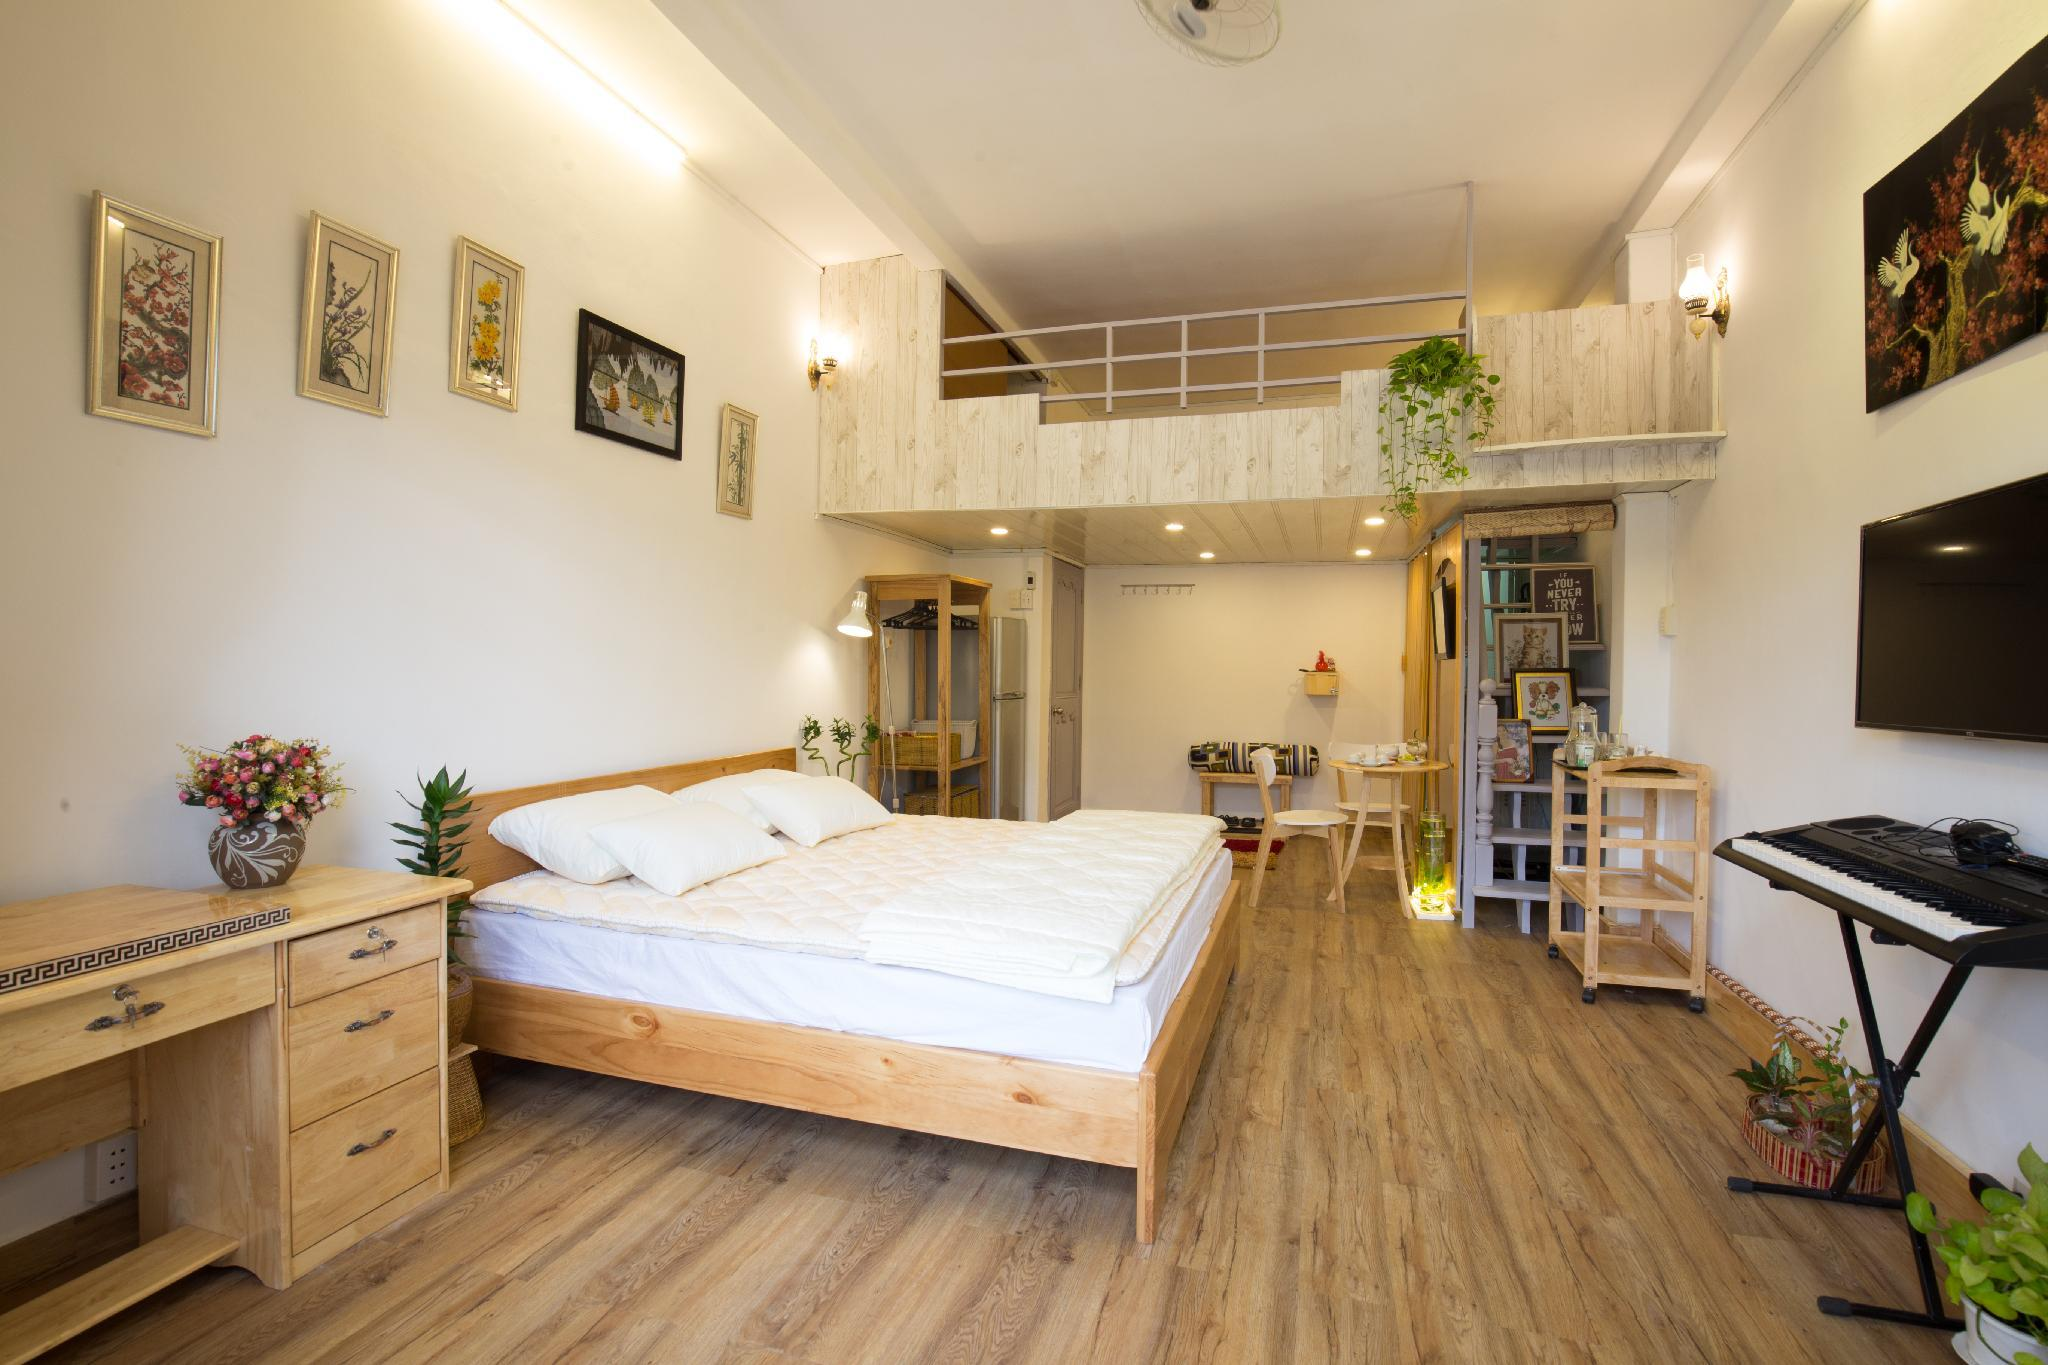 KLien's Homestay A Few Steps To BEN THANH Market